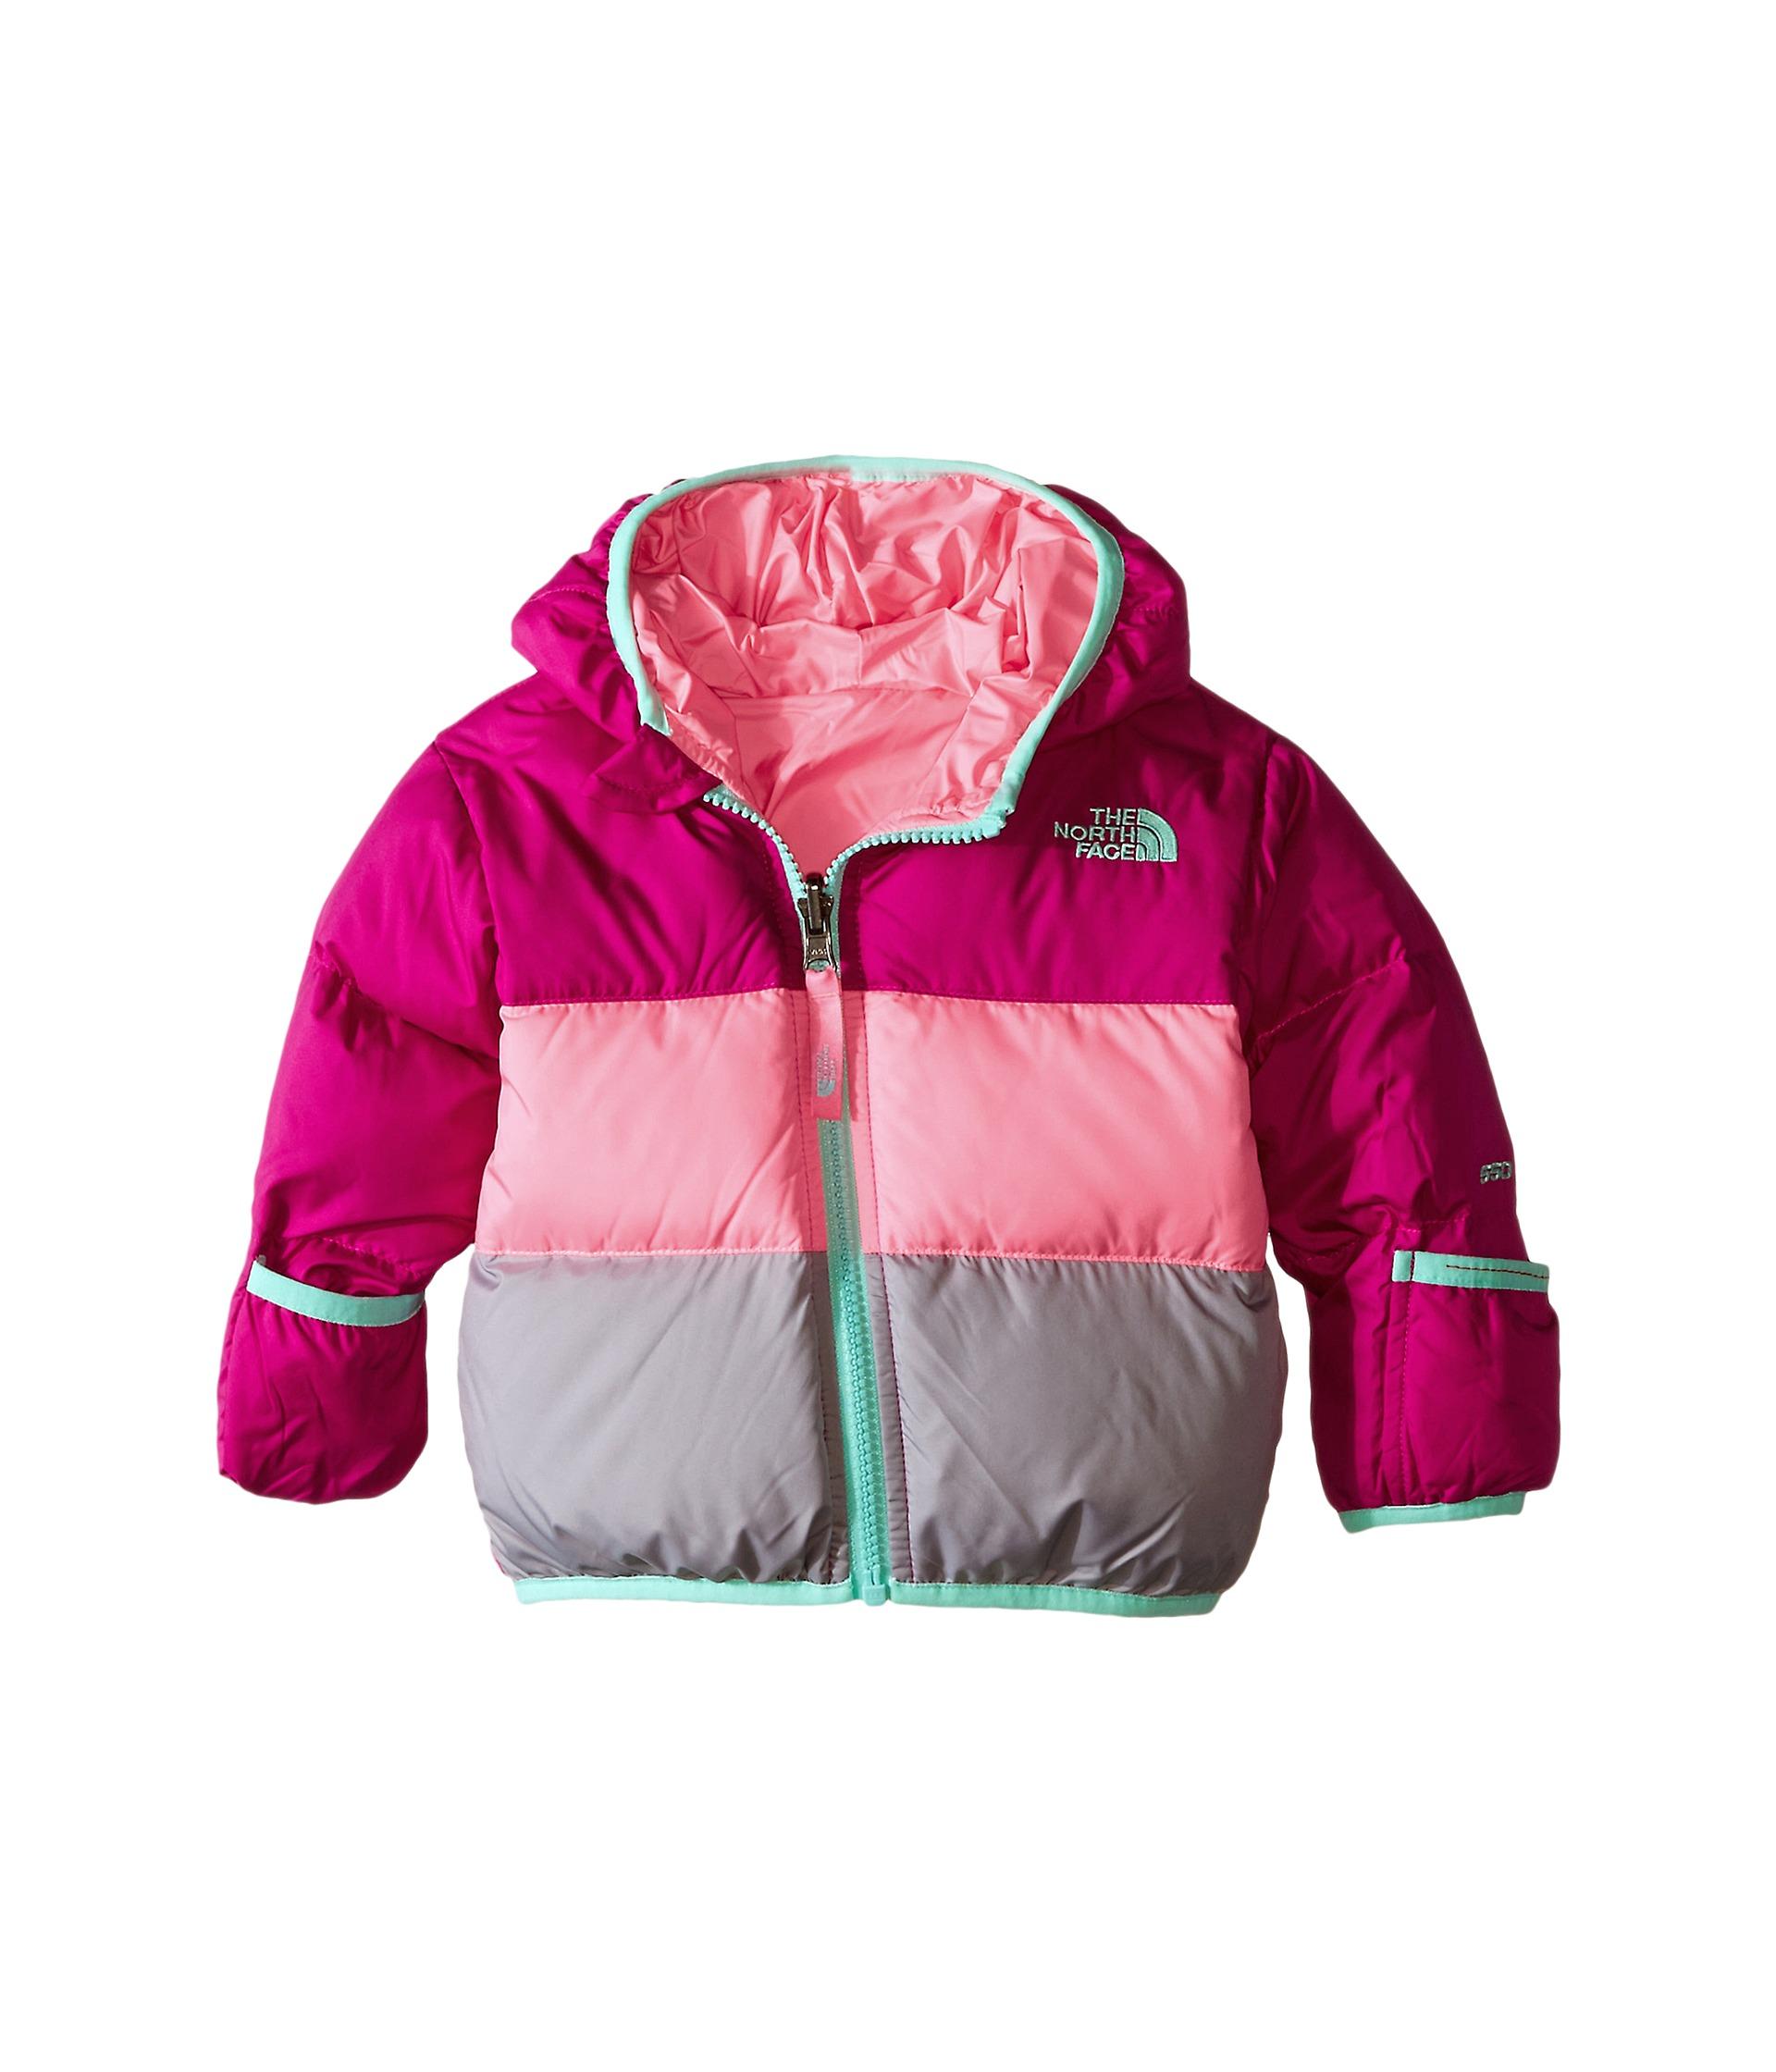 869492c89 north face infant boy jacket - Marwood VeneerMarwood Veneer